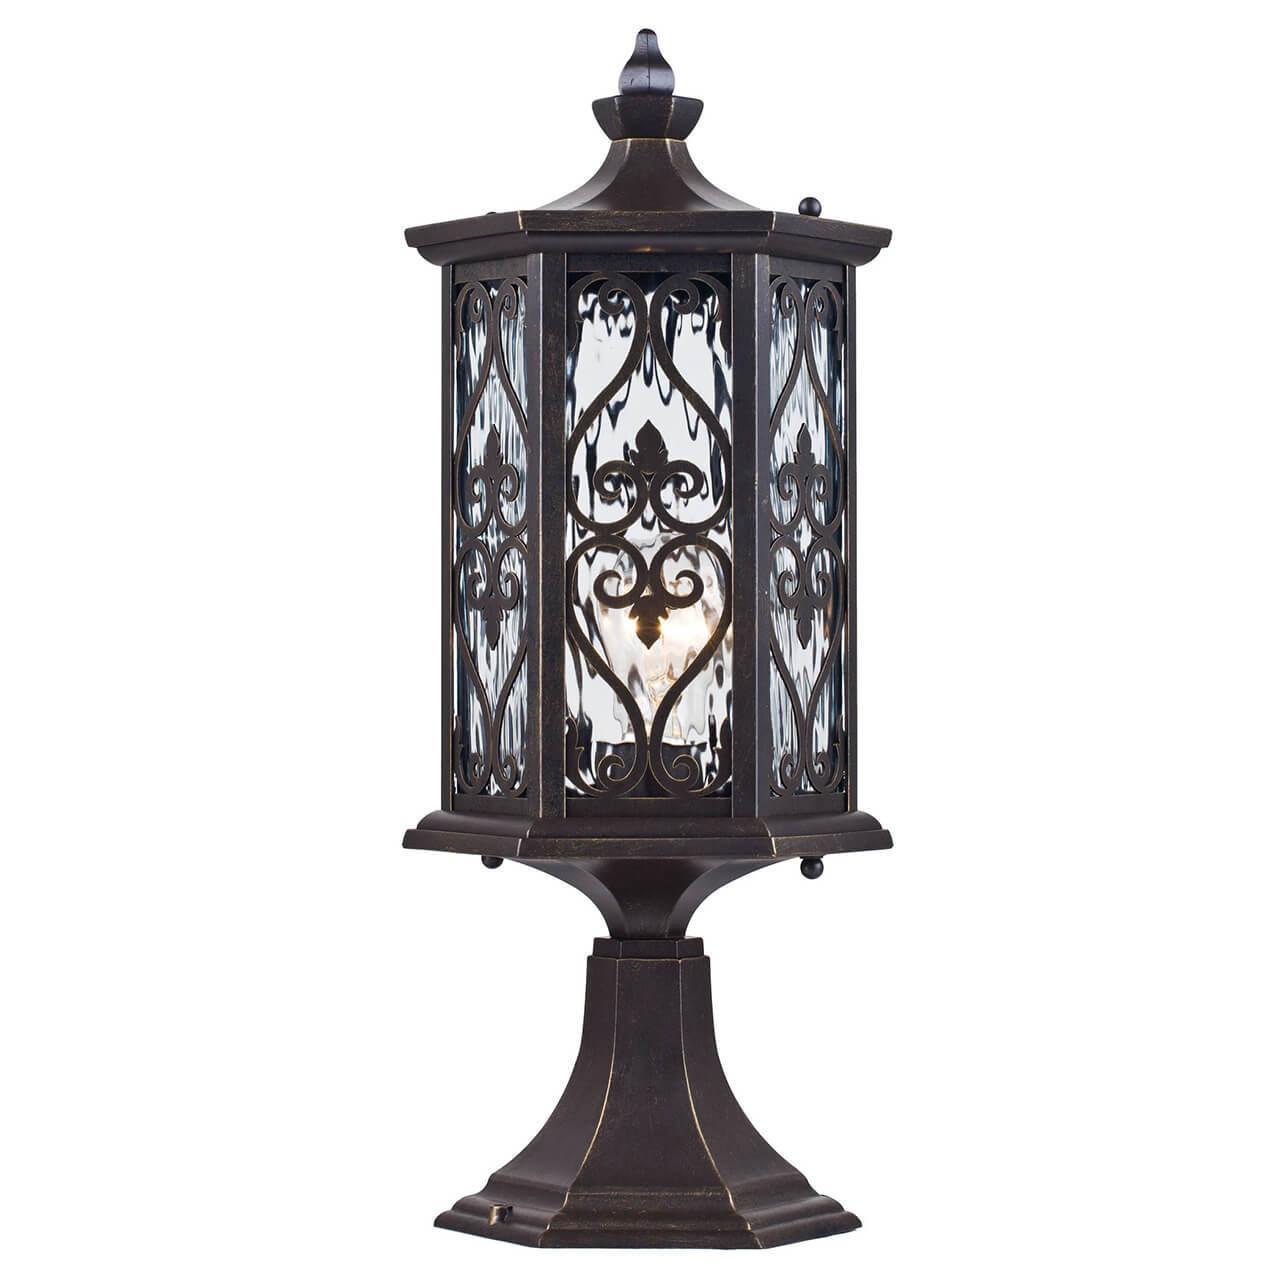 Уличный светильник Maytoni S102-46-31-R, E27